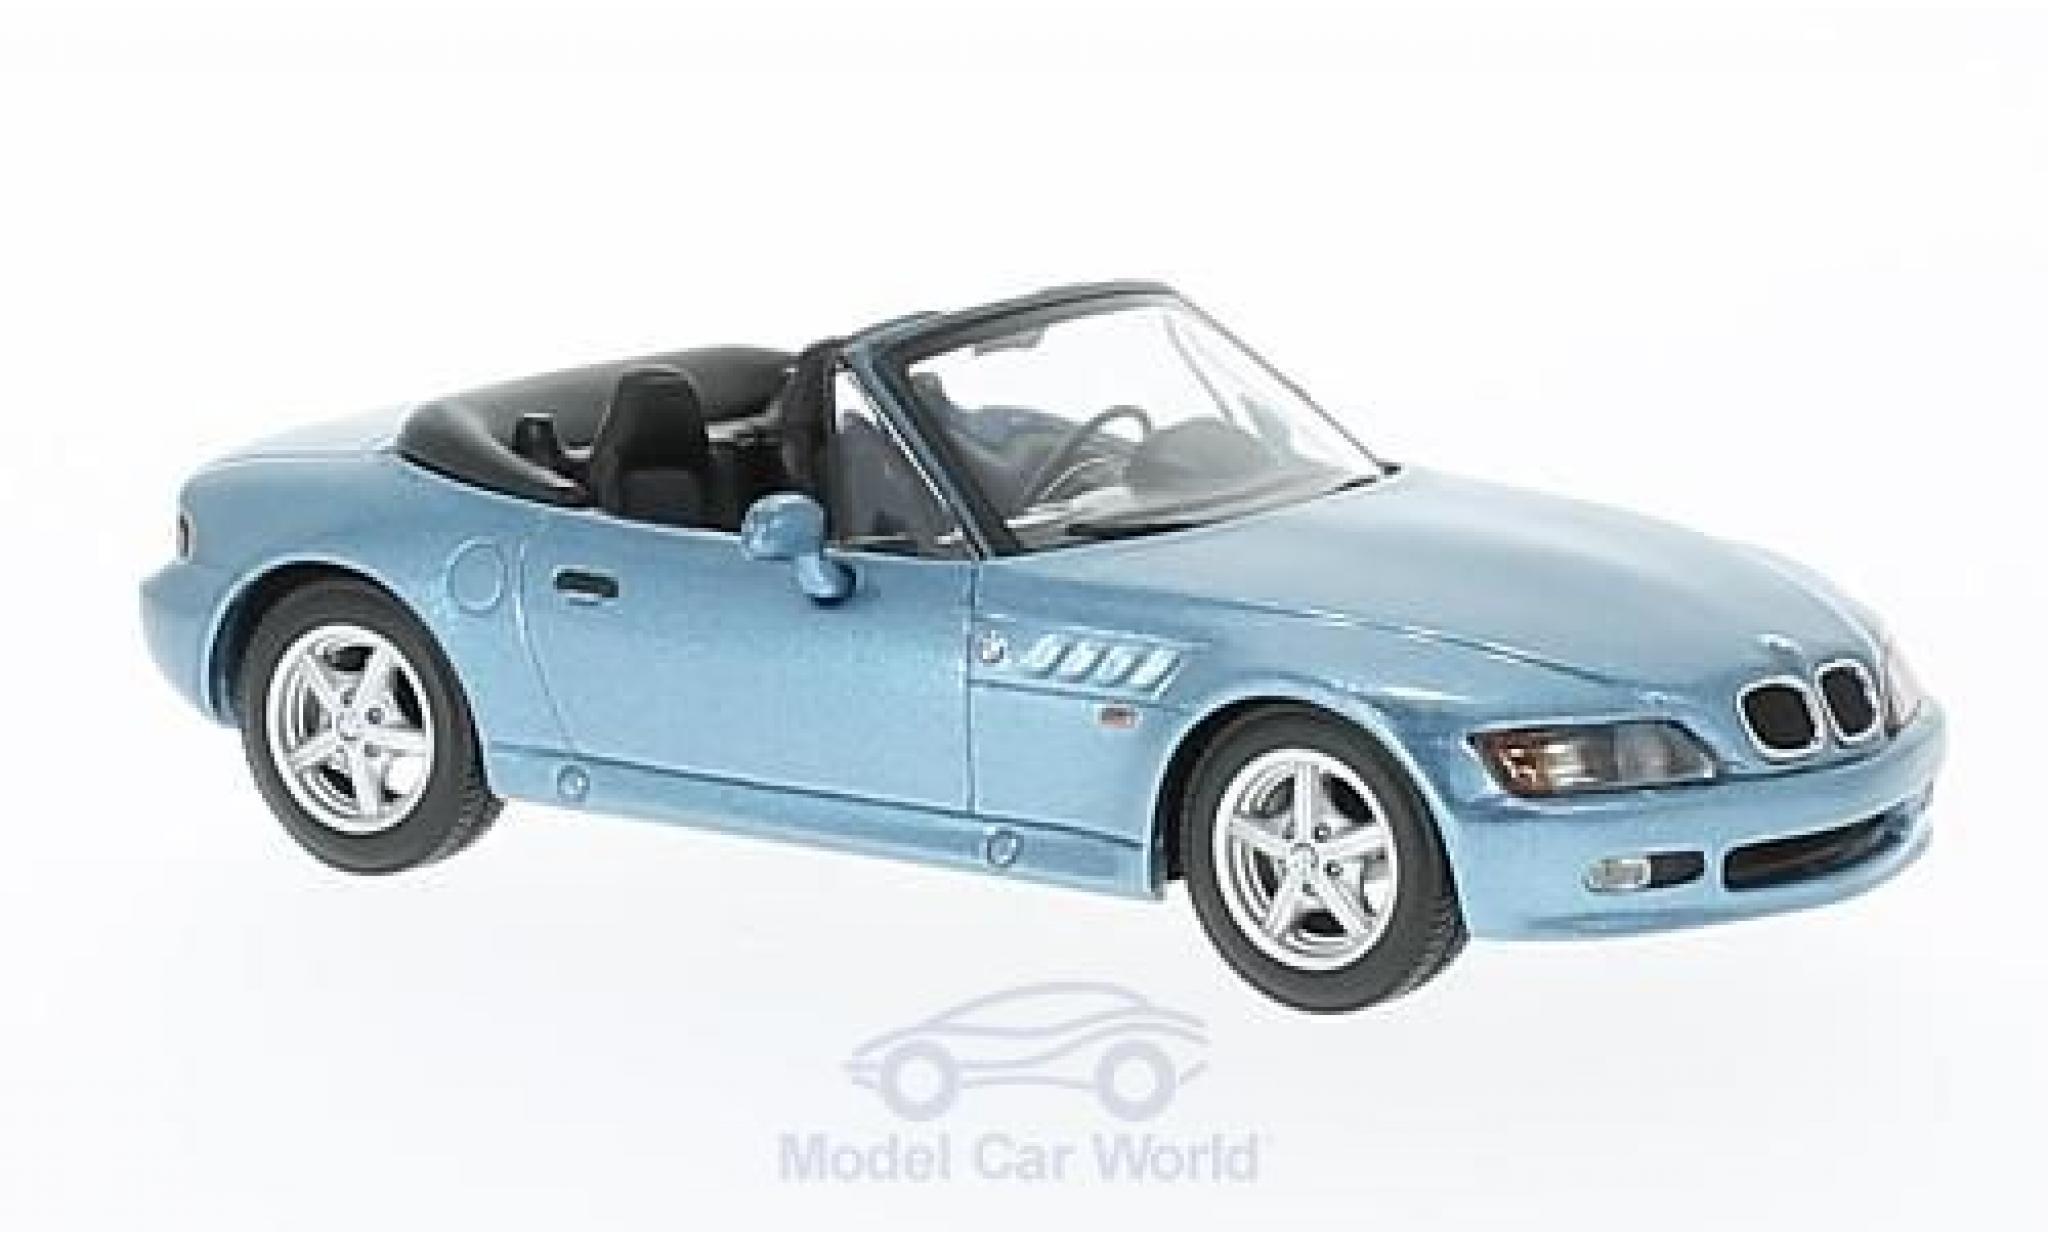 Diecast Model Cars Bmw Z3 M 1 43 Maxichamps Metallise Blue 1997 Alldiecast Us